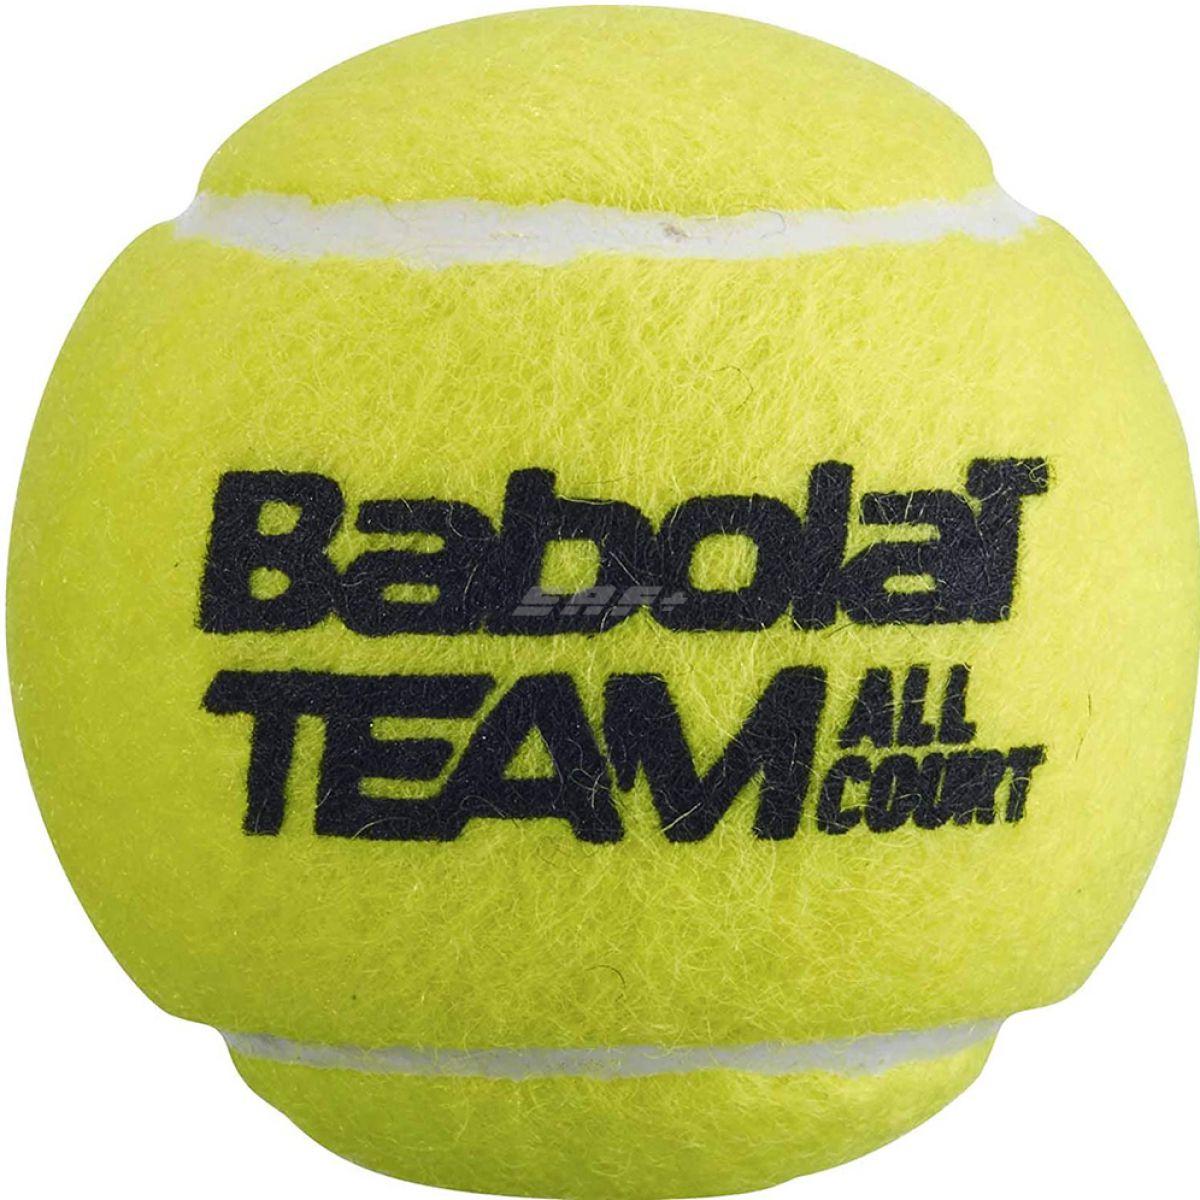 Мяч теннисный BABOLAT Team All Court,арт.502081, уп.4 шт,одобр.ITF, сукно, нат.резина,желтый